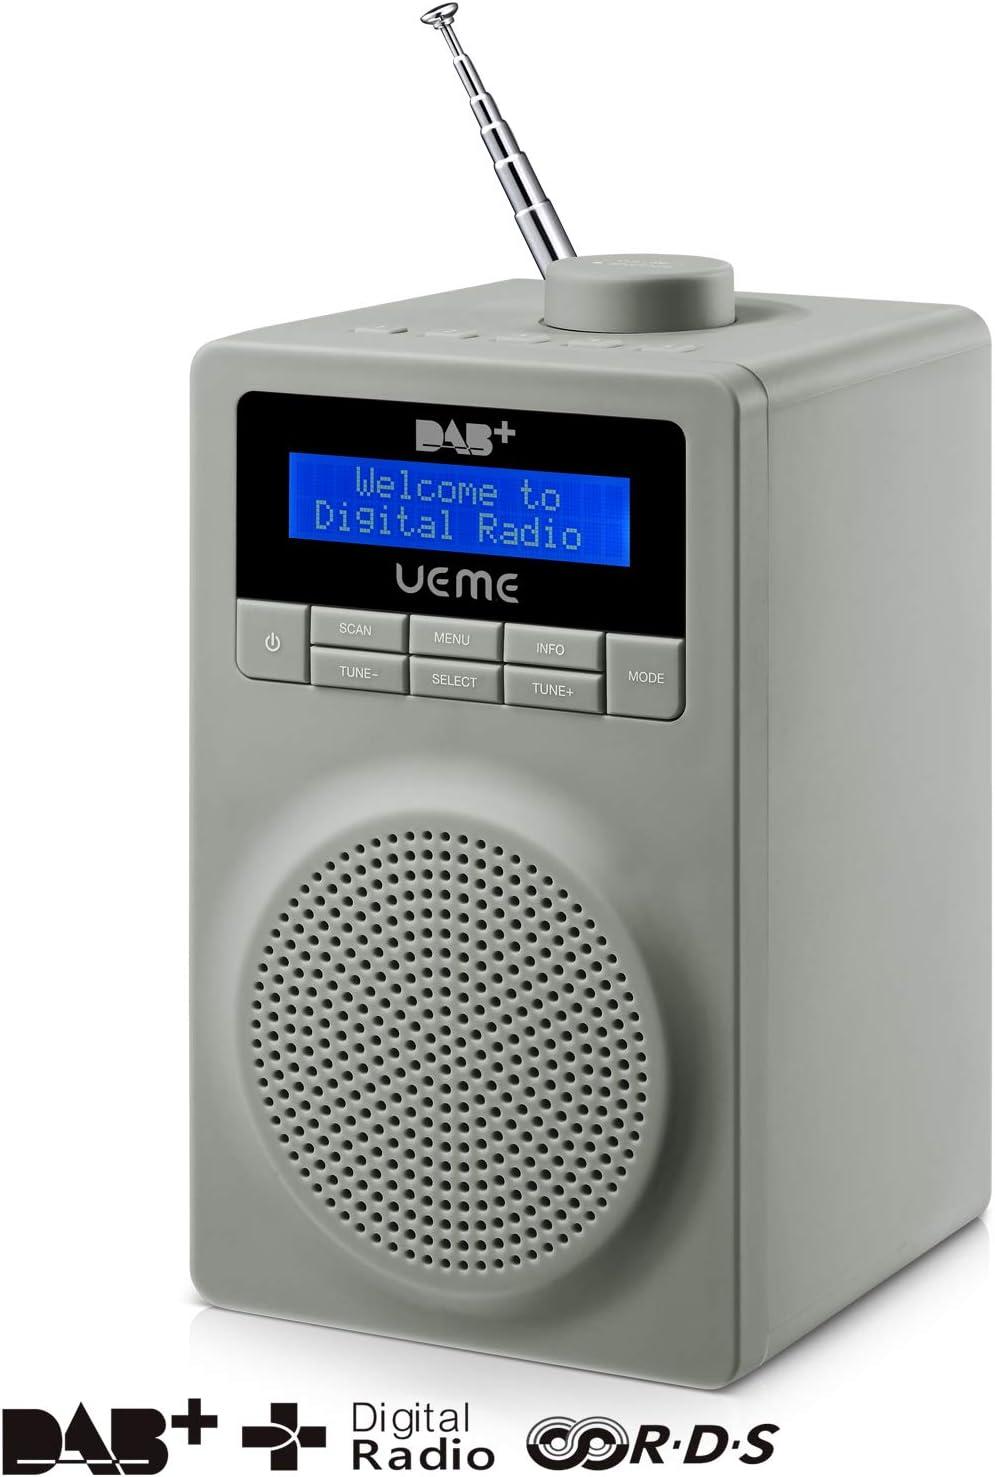 Ueme DB-18 - Radio Digital (Dab+/FM), Color Gris: Amazon.es